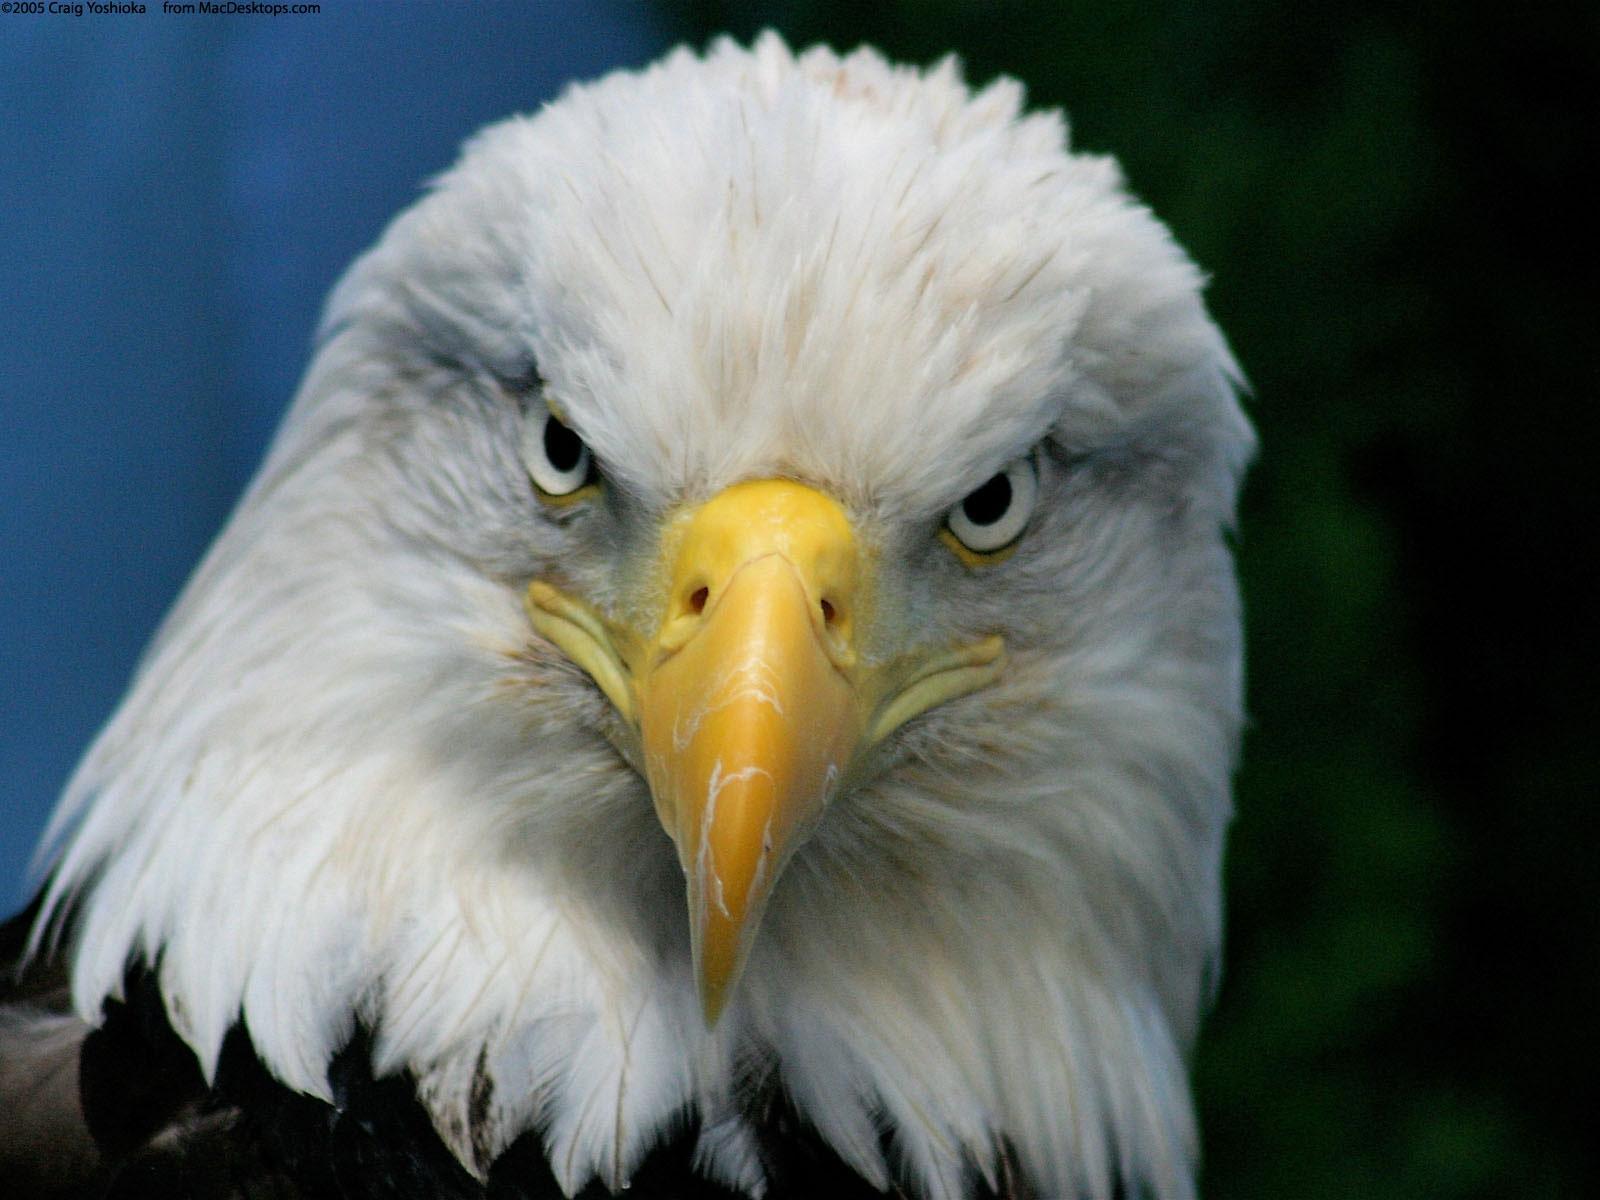 eagle hd background